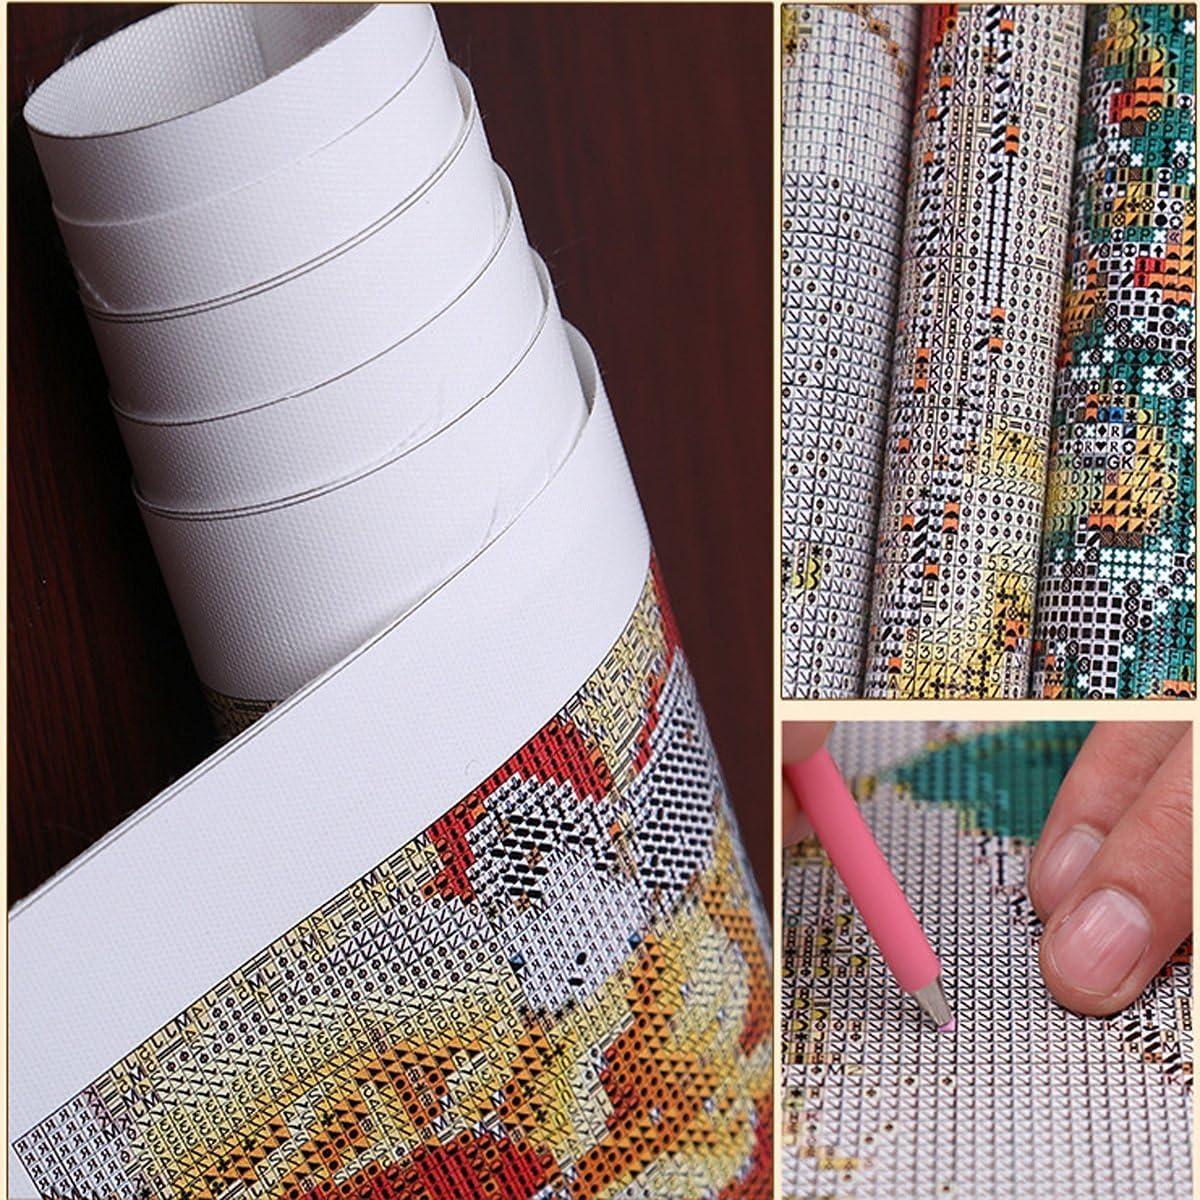 12X12inch//30X30CM Blxecky 5D DIY Diamond Painting By Number Kits,bridge